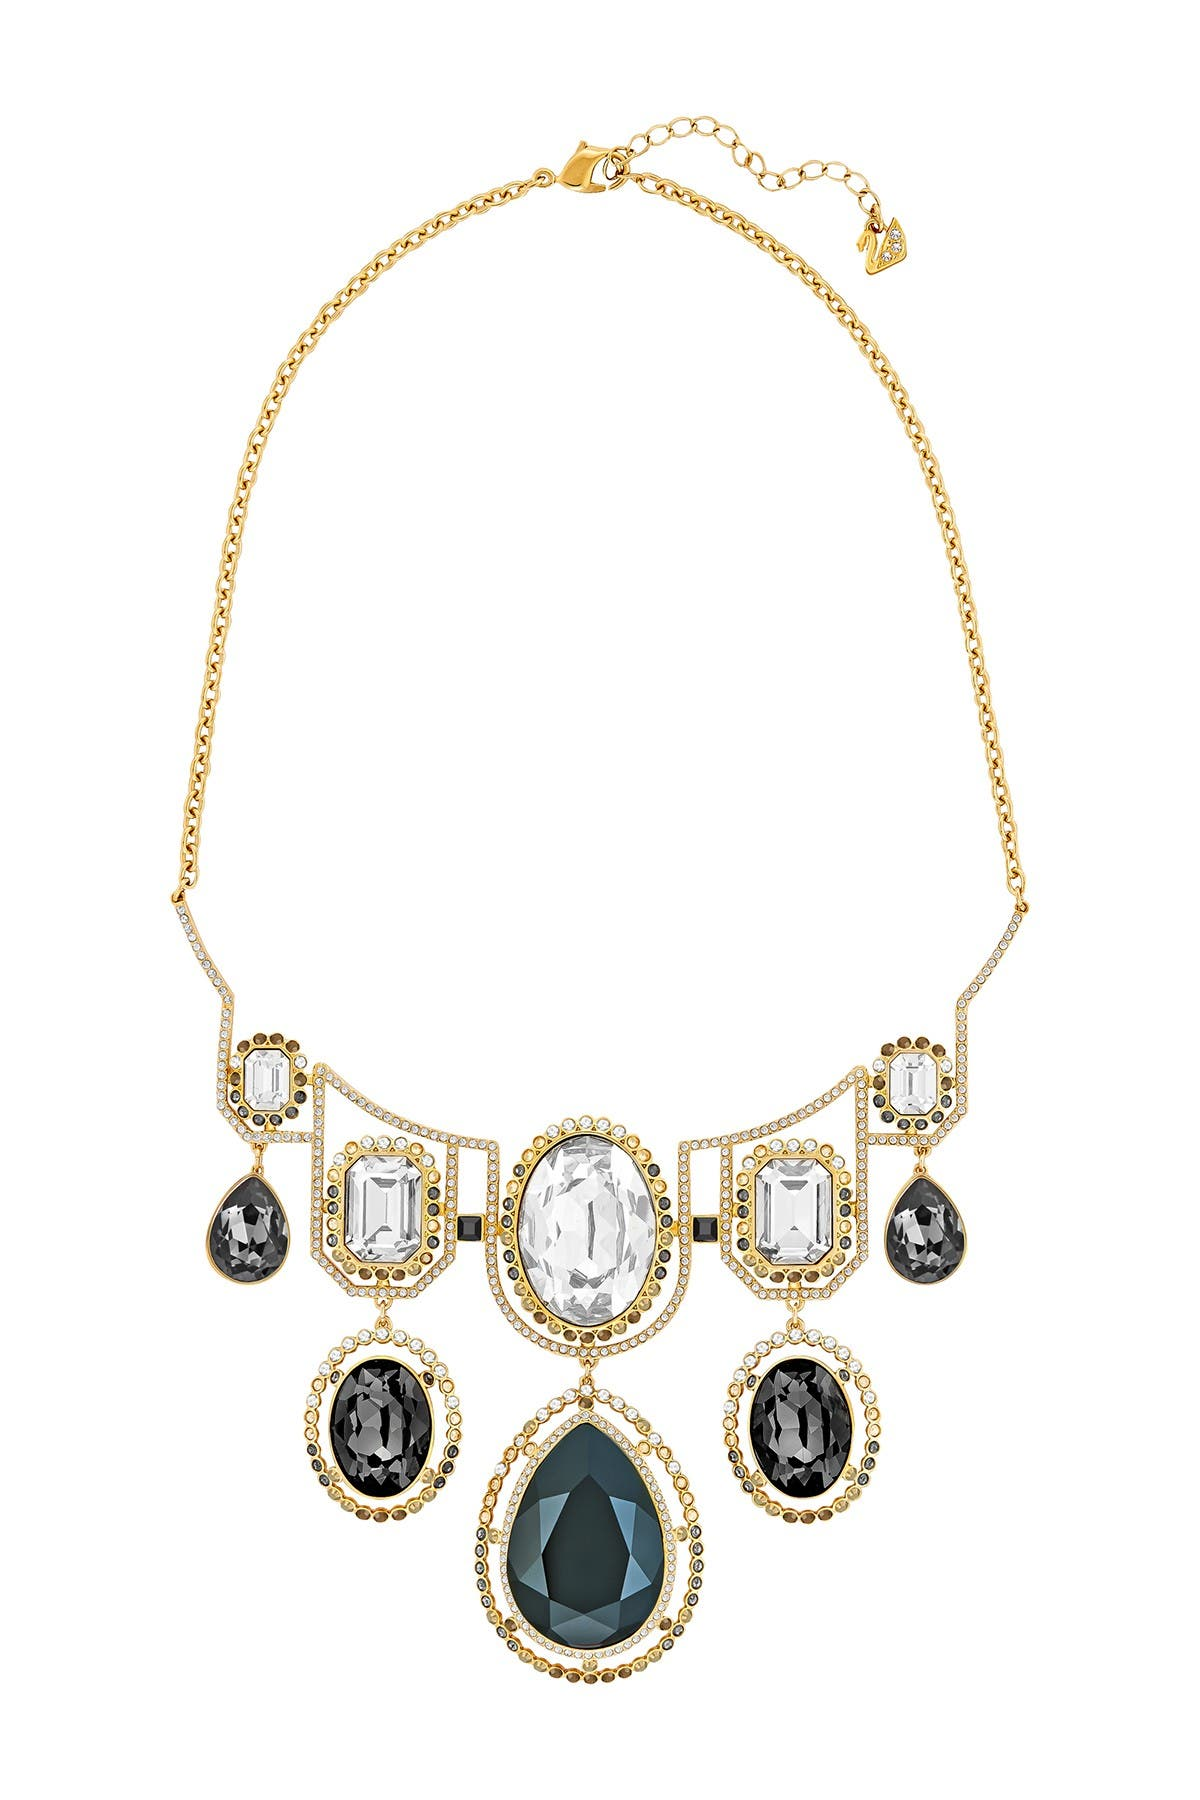 Image of Swarovski Darling Bezel Set Multicolored Swarovski Crystal Statement Necklace